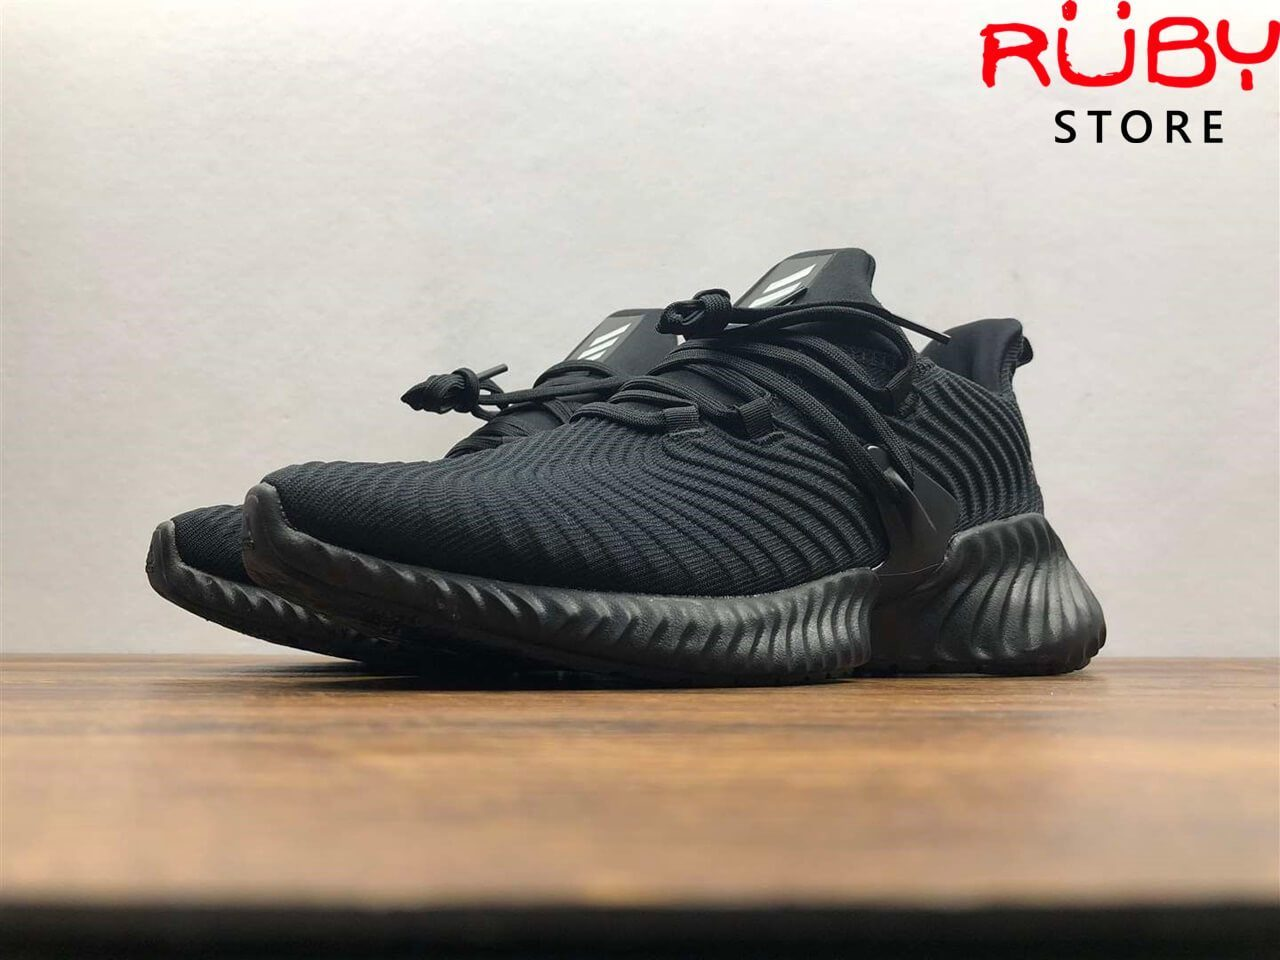 giày-alphabounce-instinct-đen-full-replica-11-ở-hcm (3)